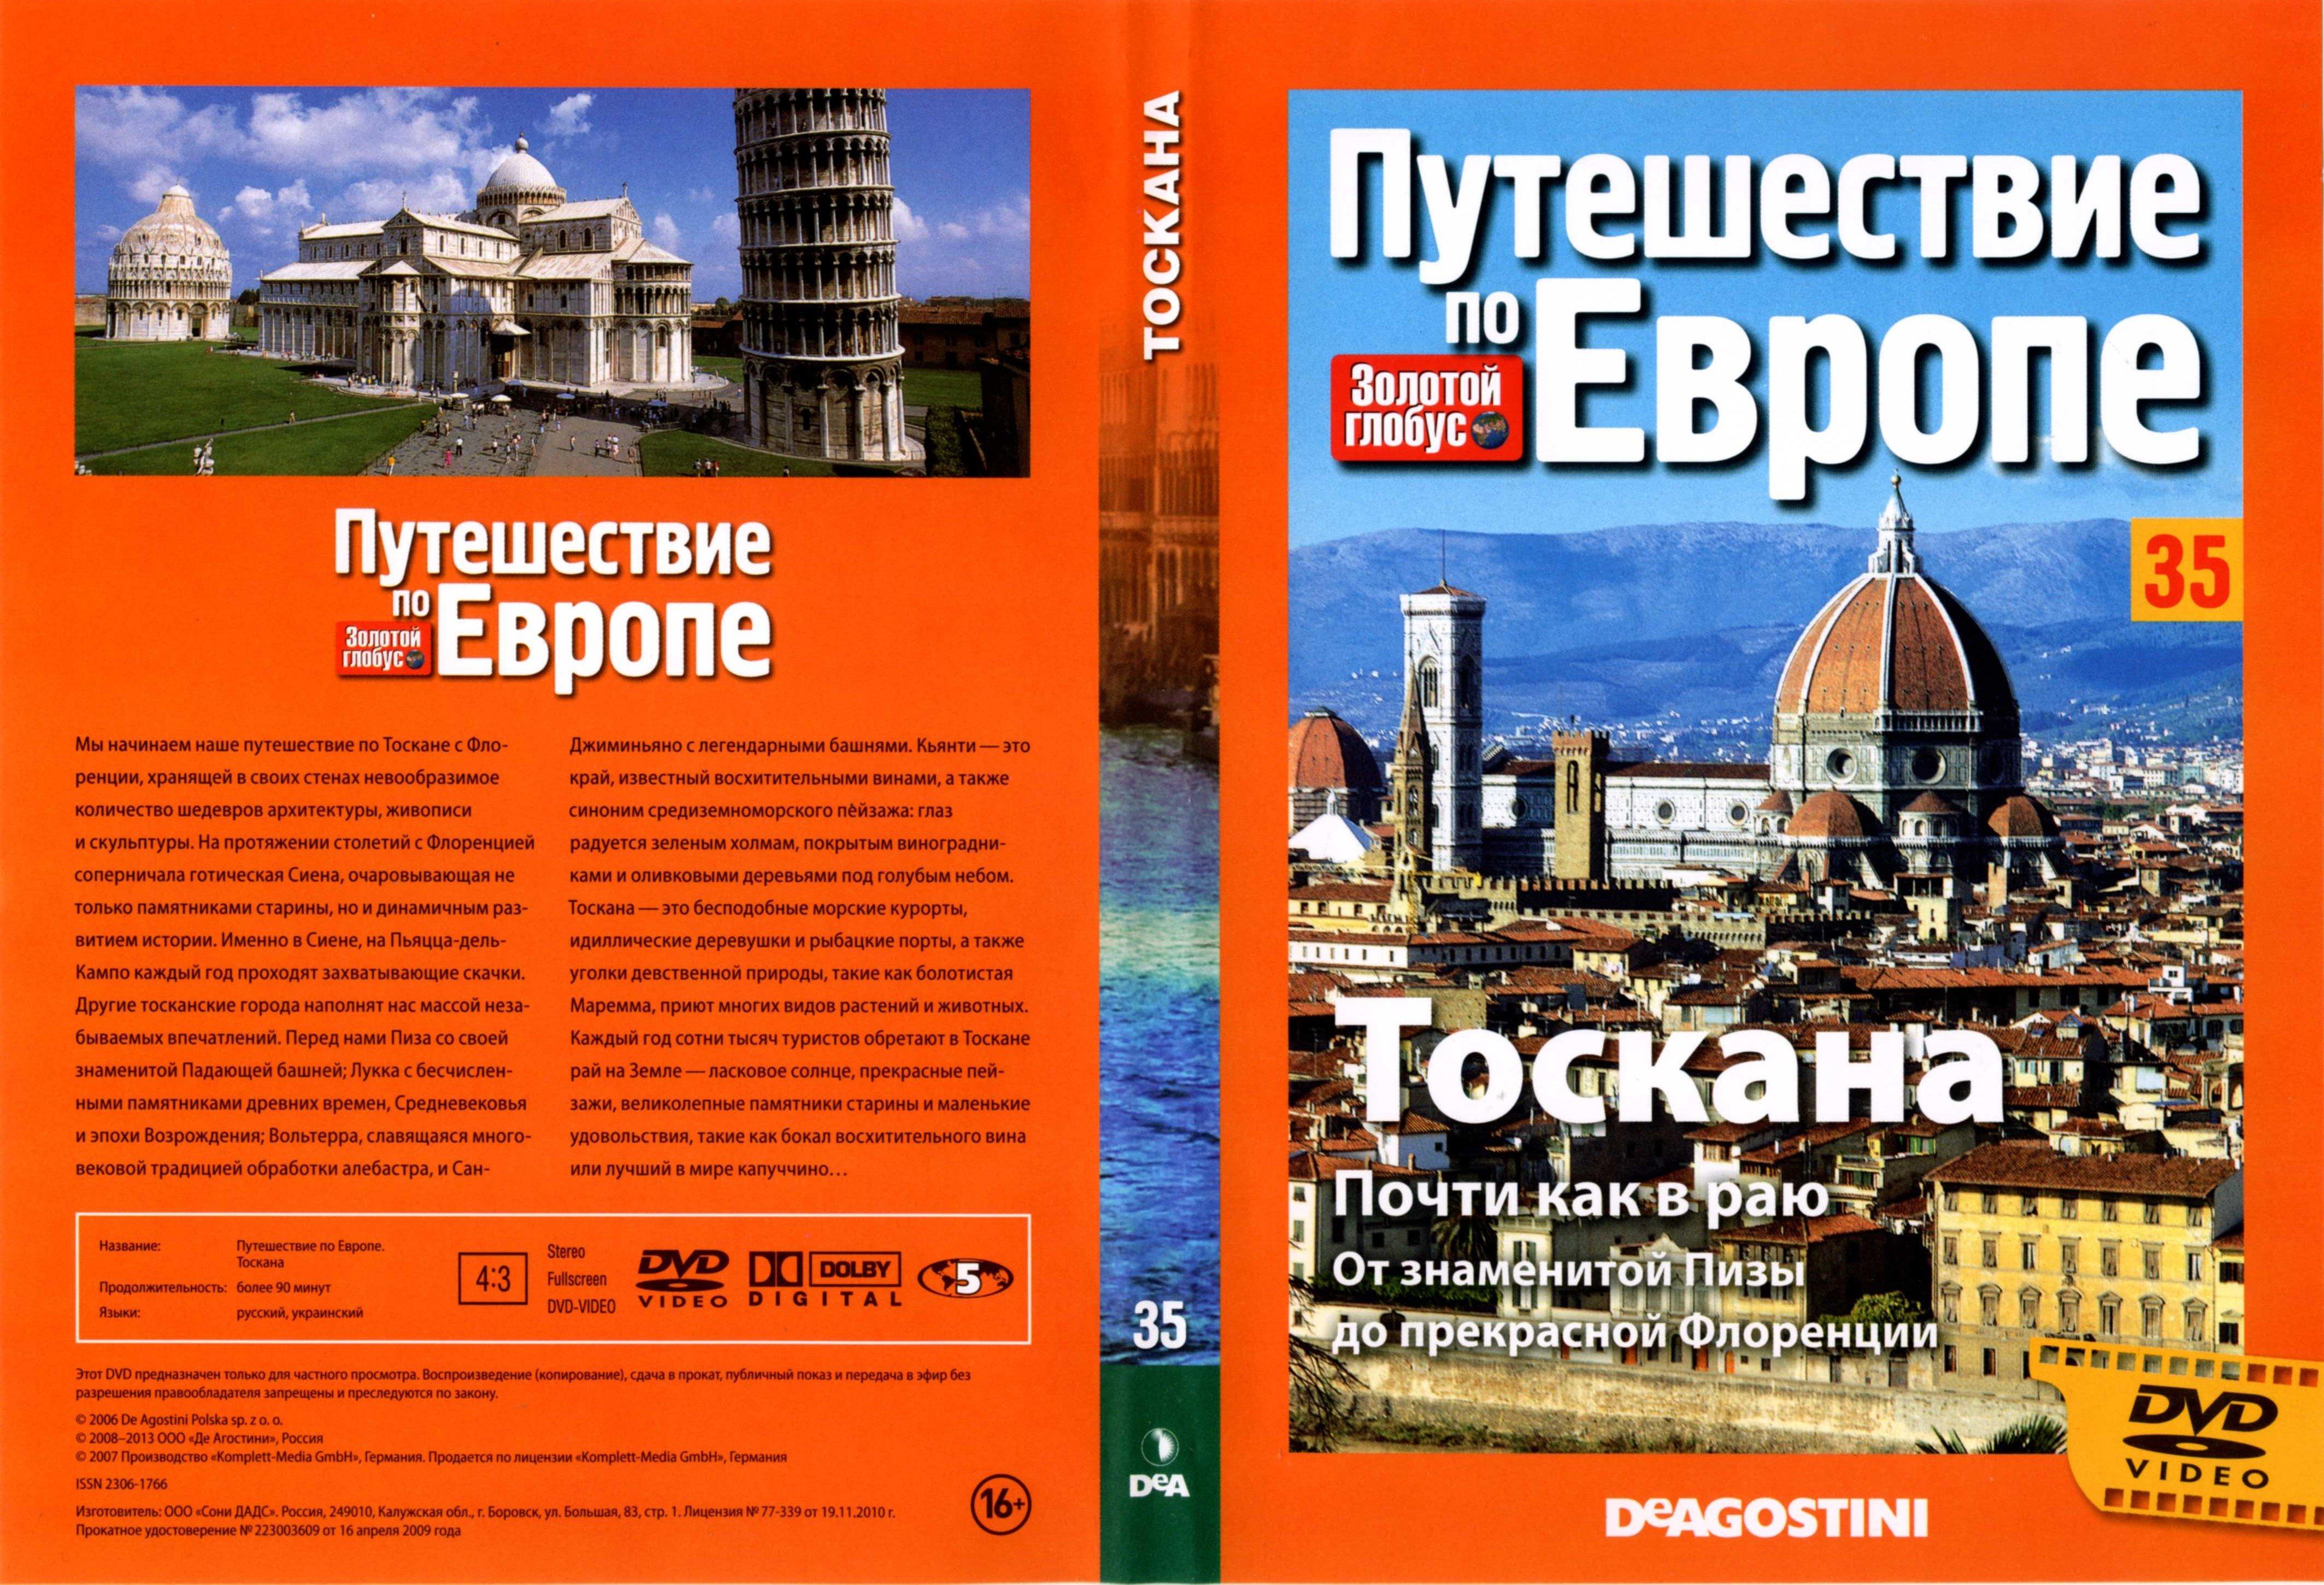 http://i5.imageban.ru/out/2013/09/28/97c51692fe9555d27b83205baa852b41.jpg